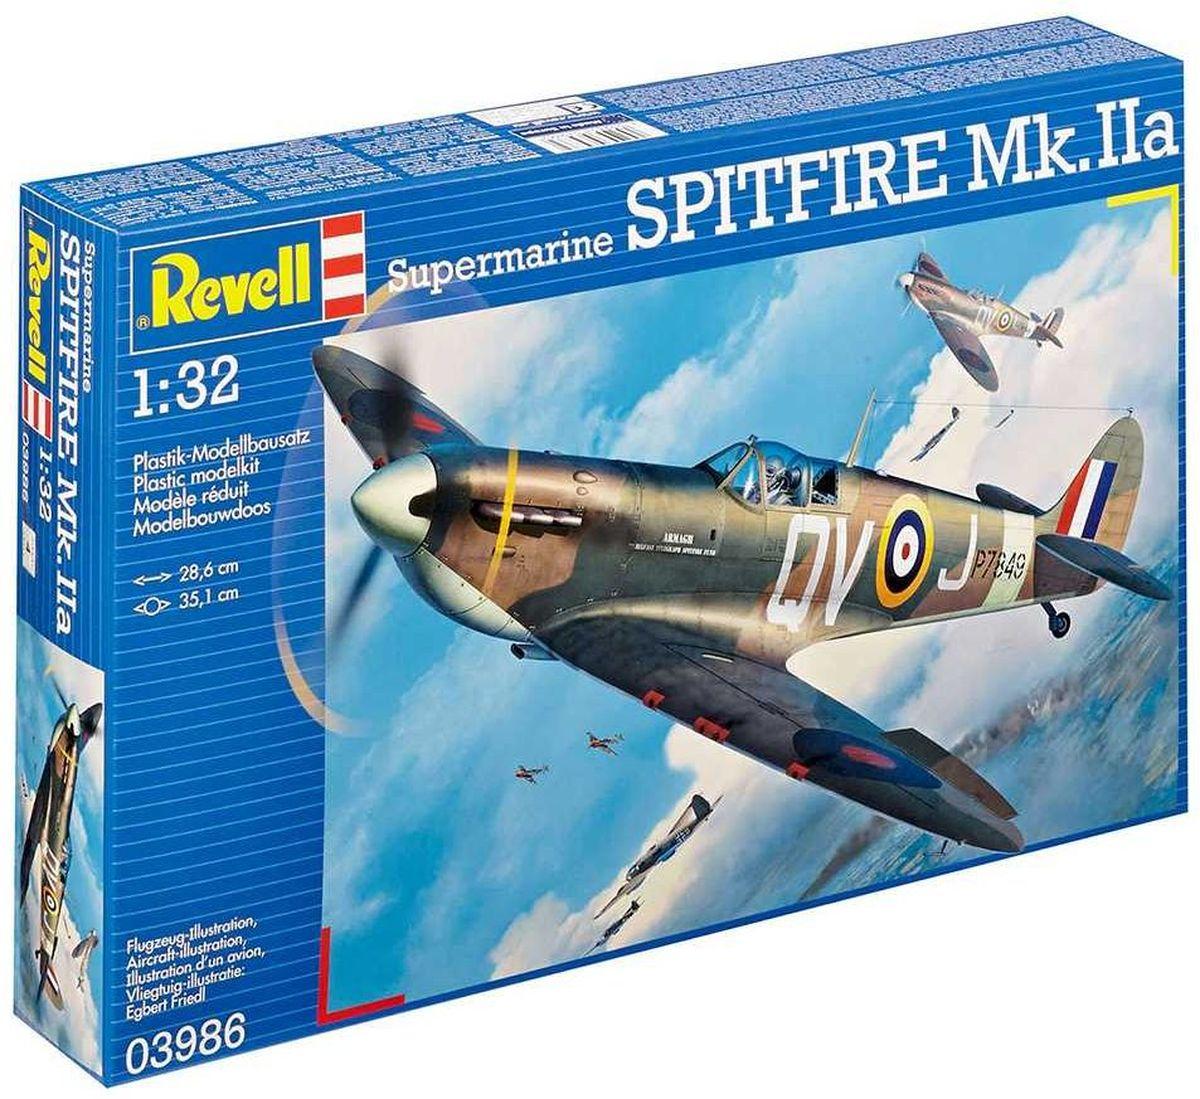 Revell Сборная модель Истребитель Supermarine Spitfire Mk IIa